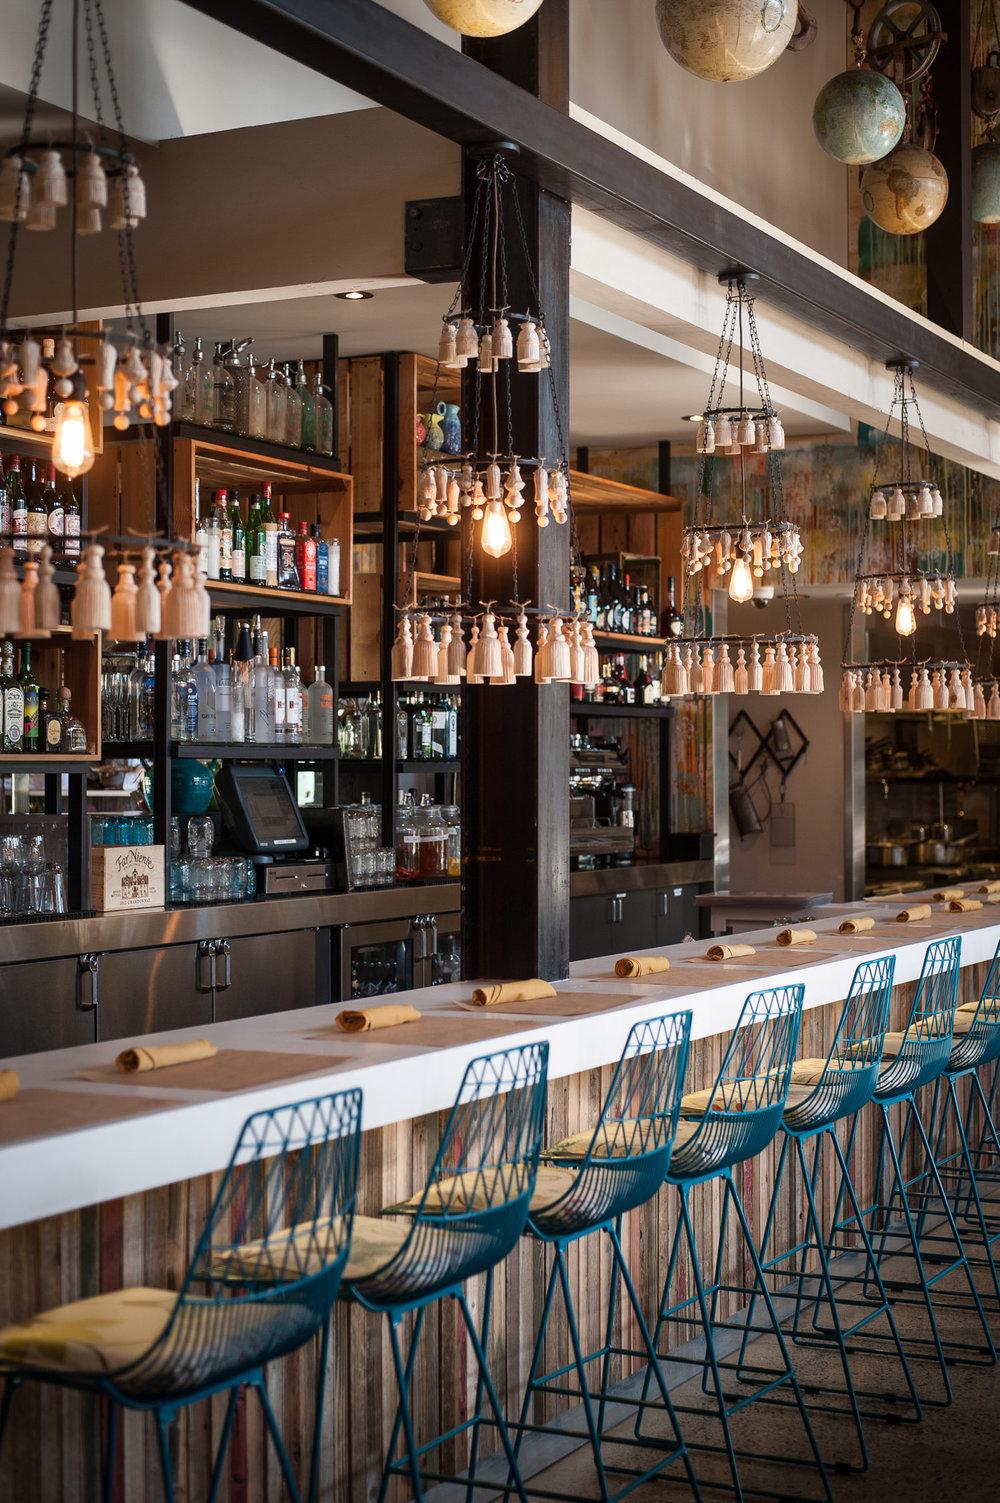 Cucina Enoteca restaurant bar, restaurant photography, detail of restaurant